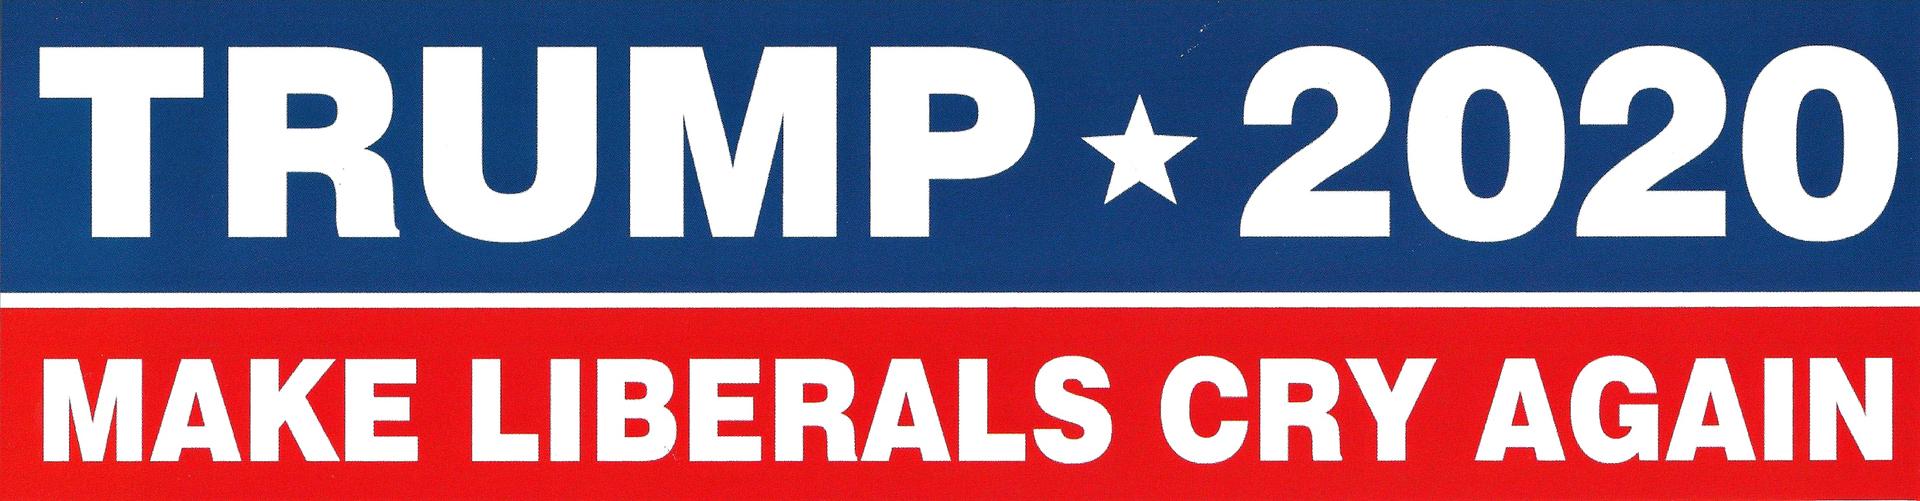 Trump 2020, Make Liberals Cry